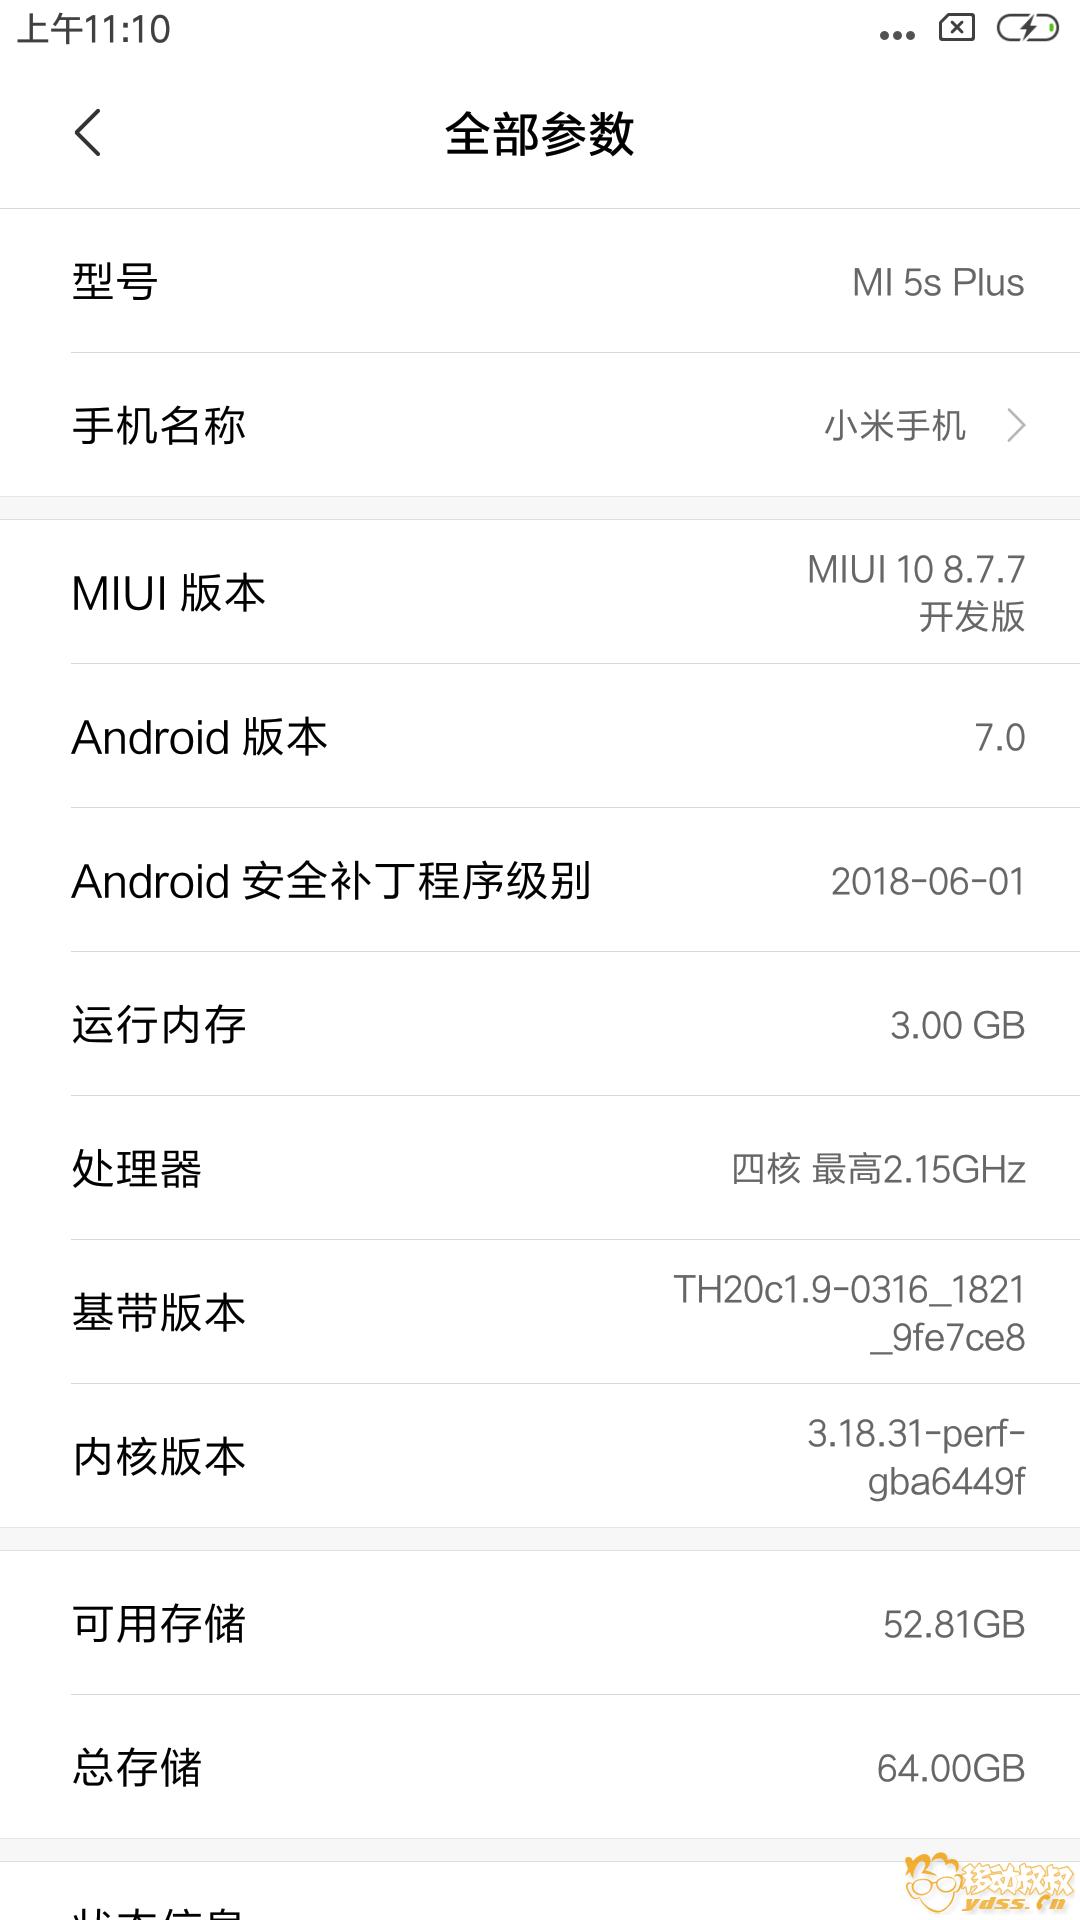 Screenshot_2018-07-07-11-10-24-632_com.android.settings.png